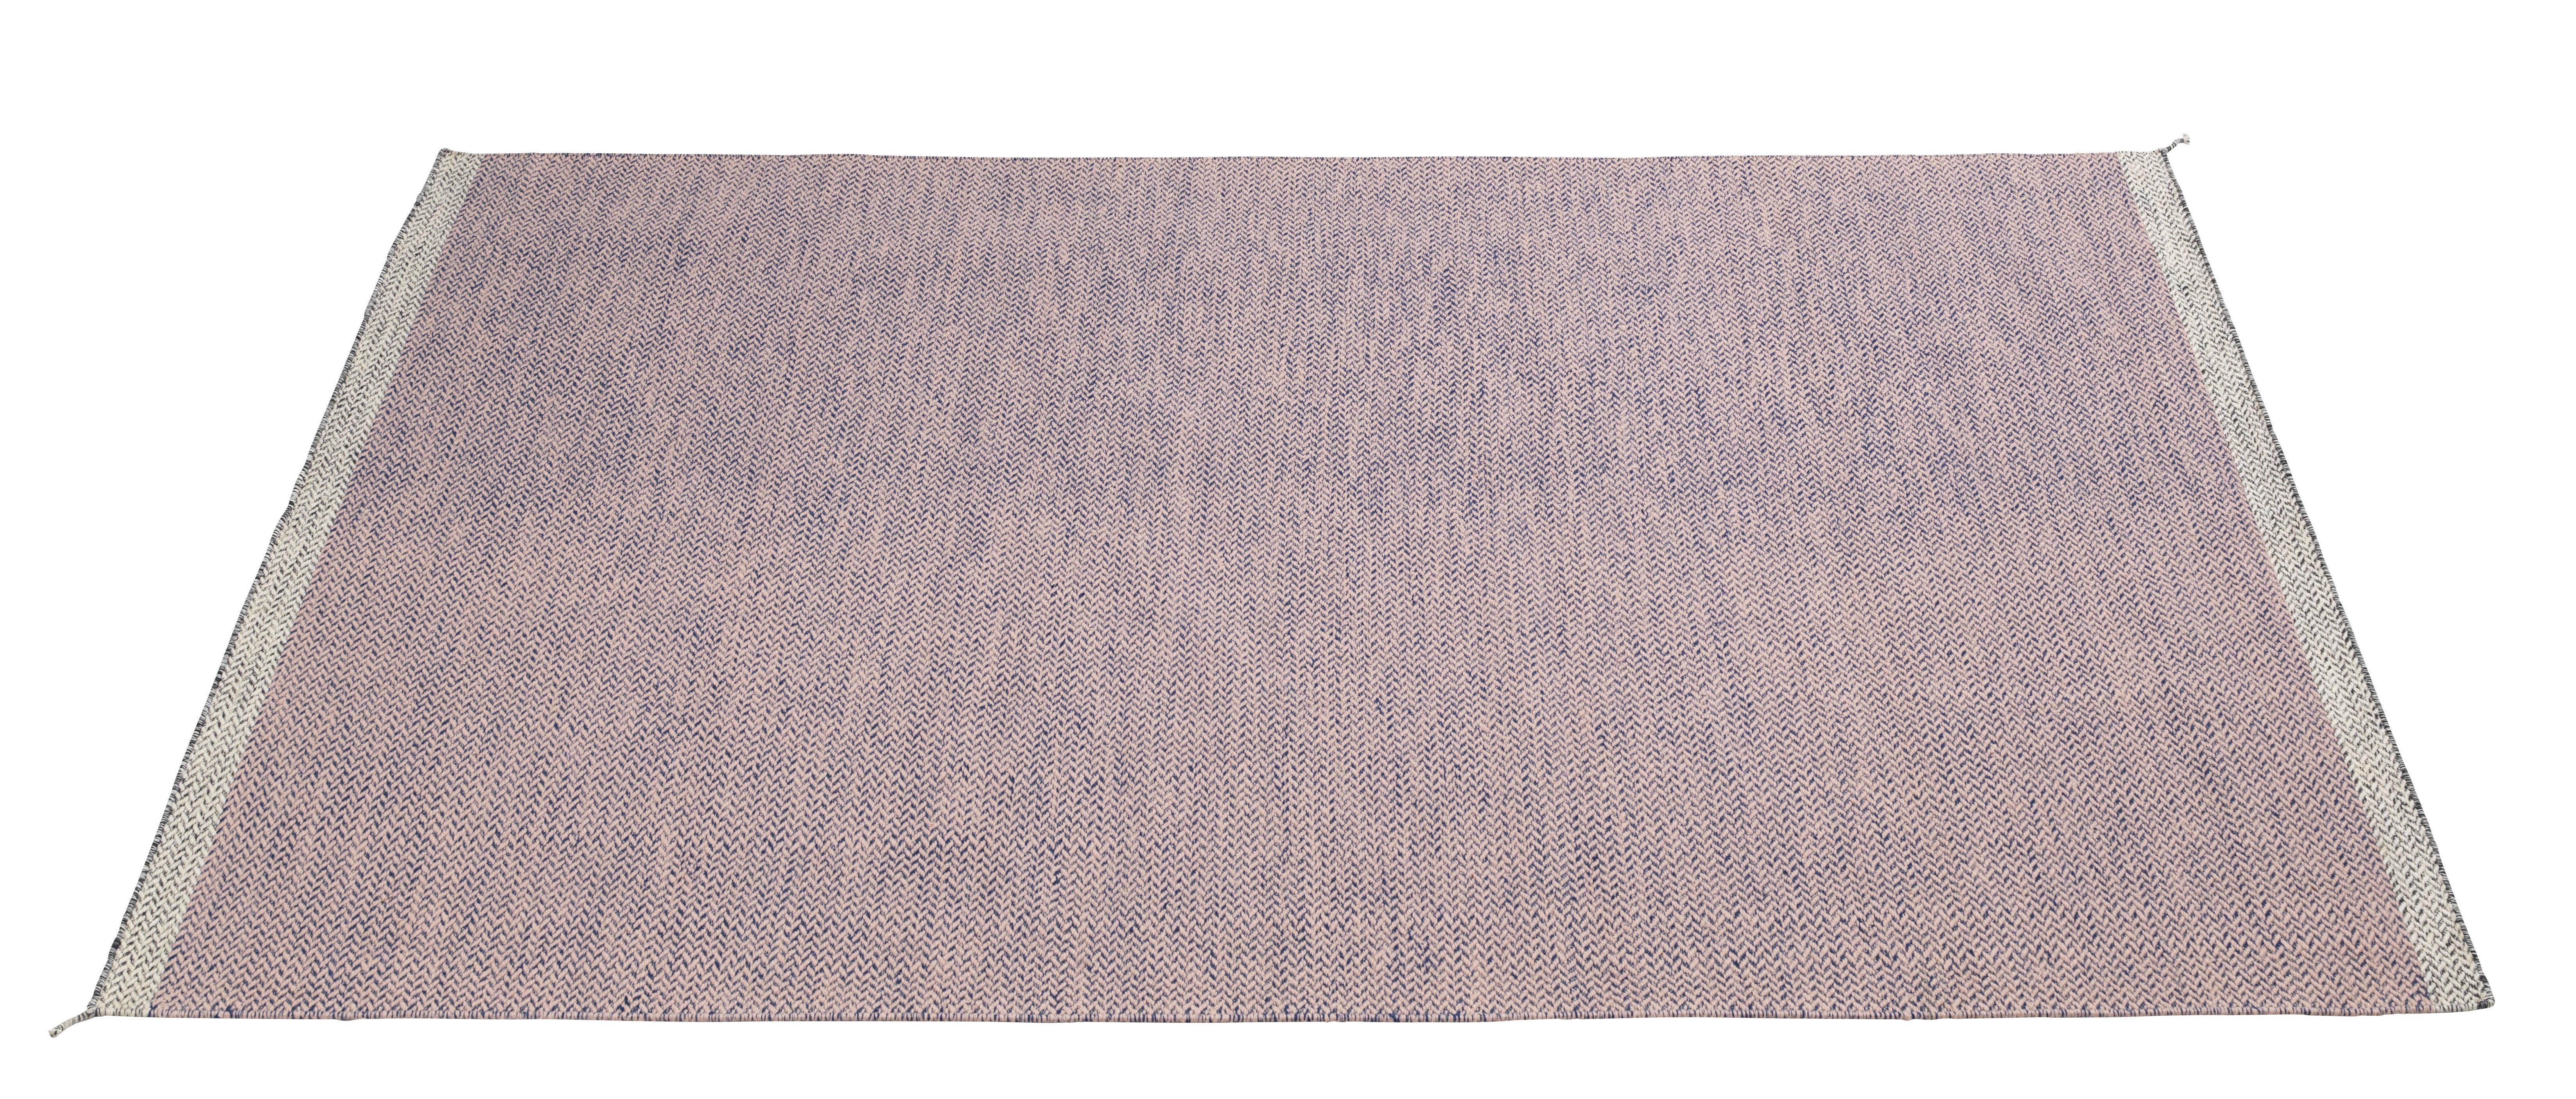 Interni - Tappeti - Tappeto PLY / 200 x 300 cm - Tessuto a mano - Muuto - Rose - Lana